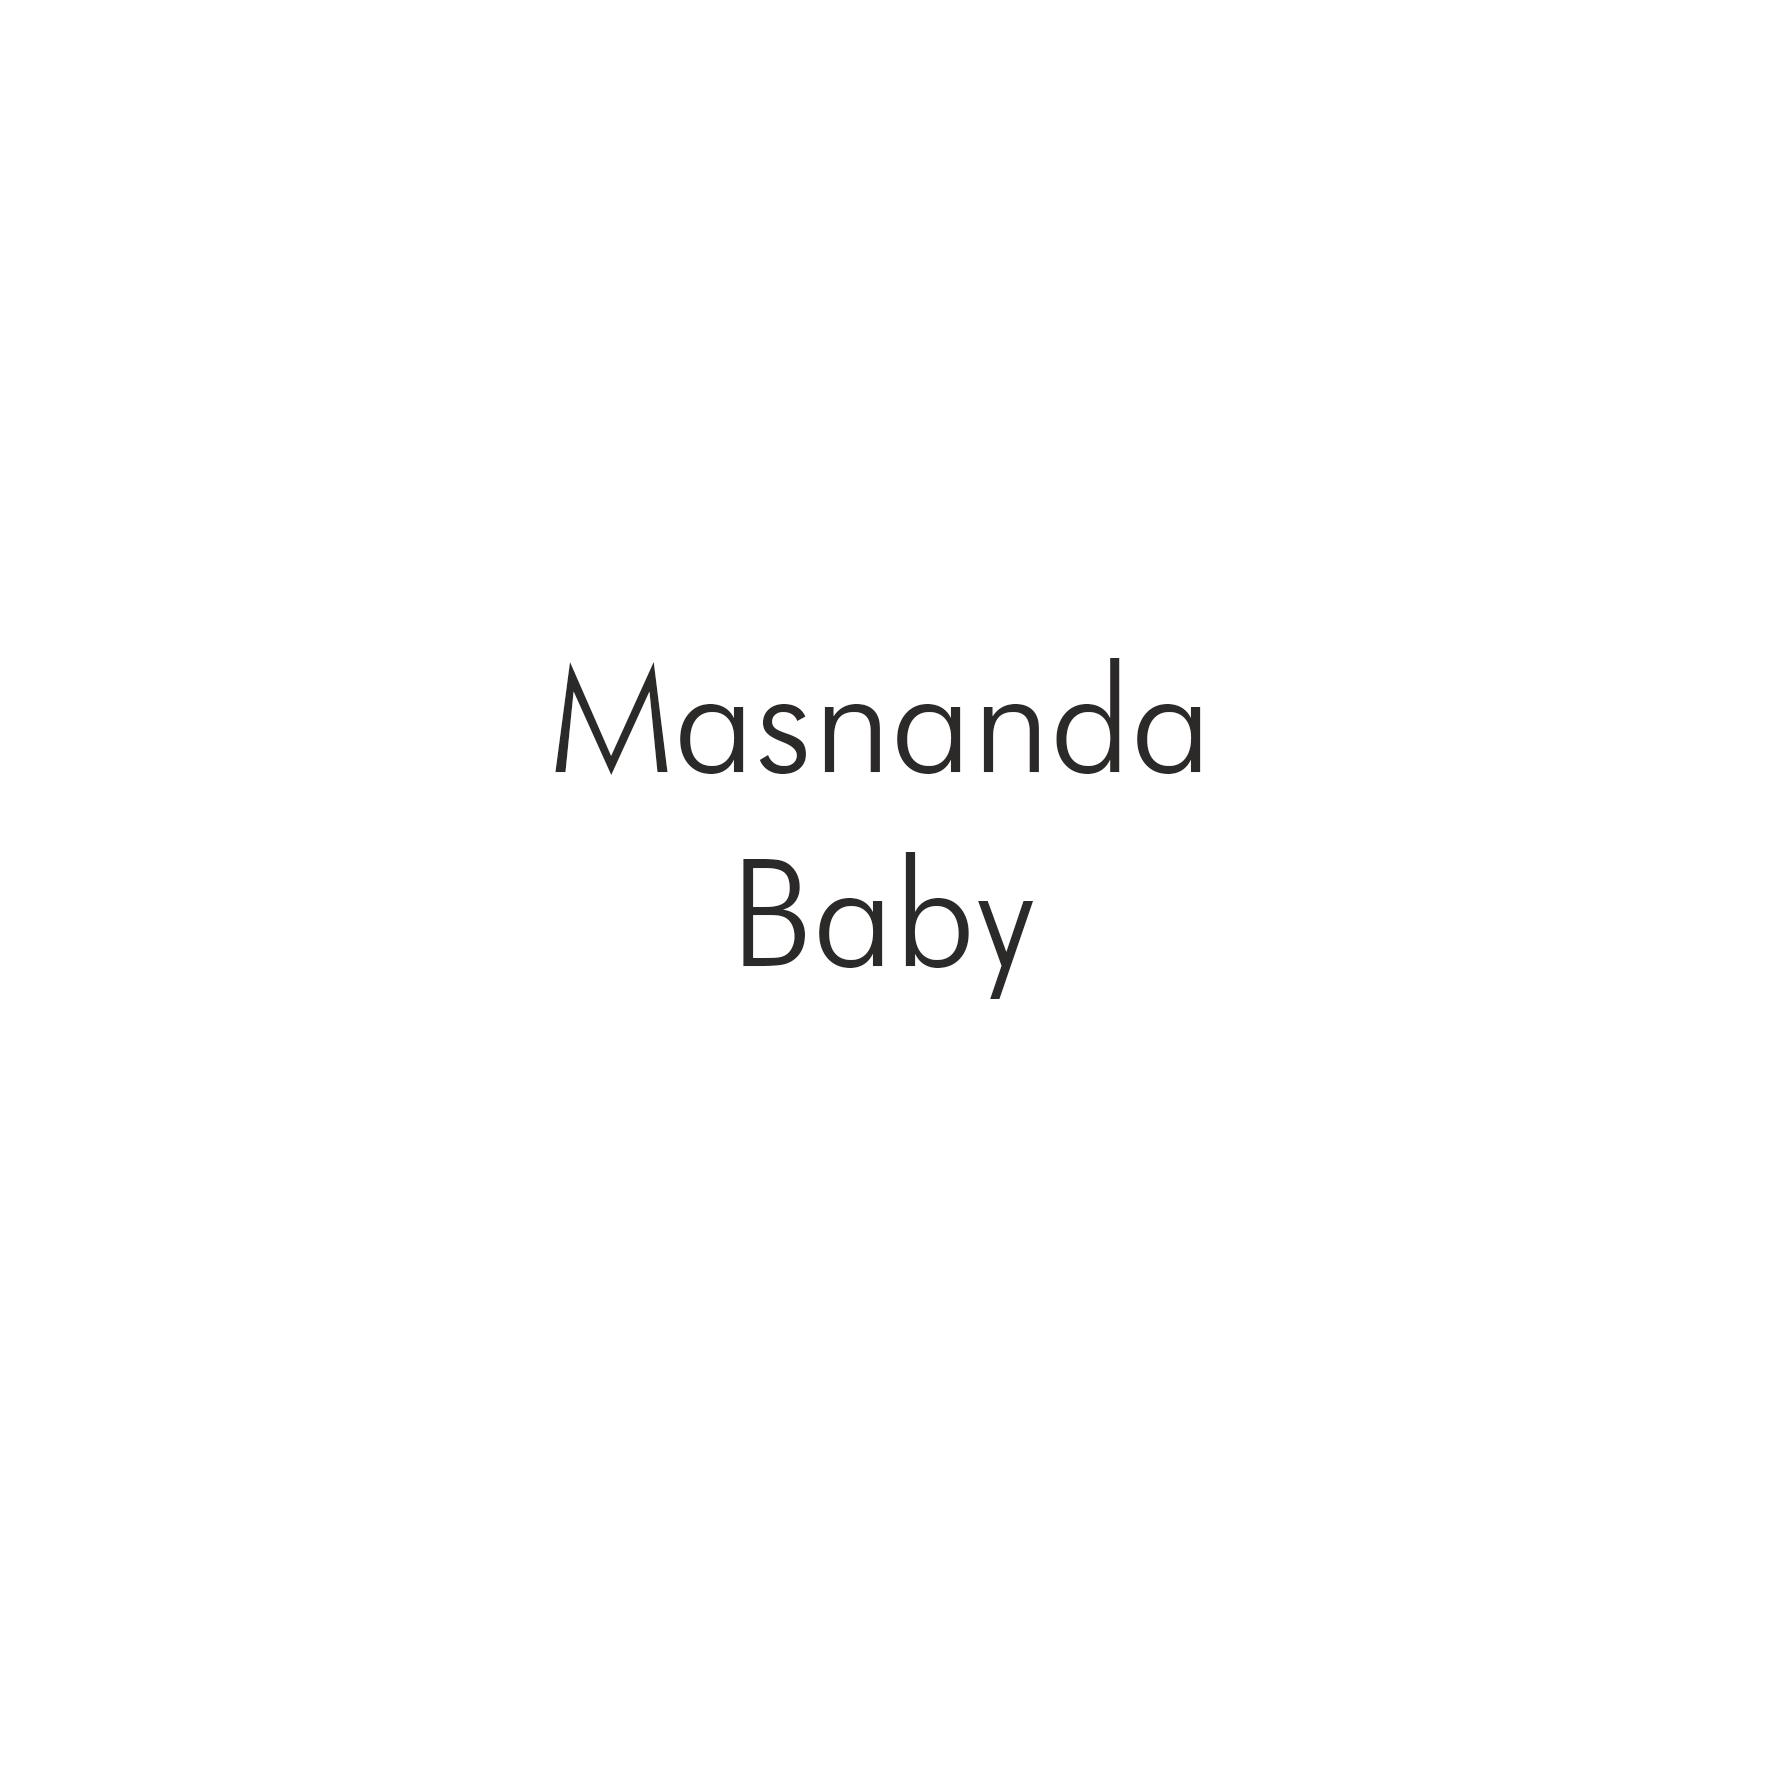 Masnanda Baby.png